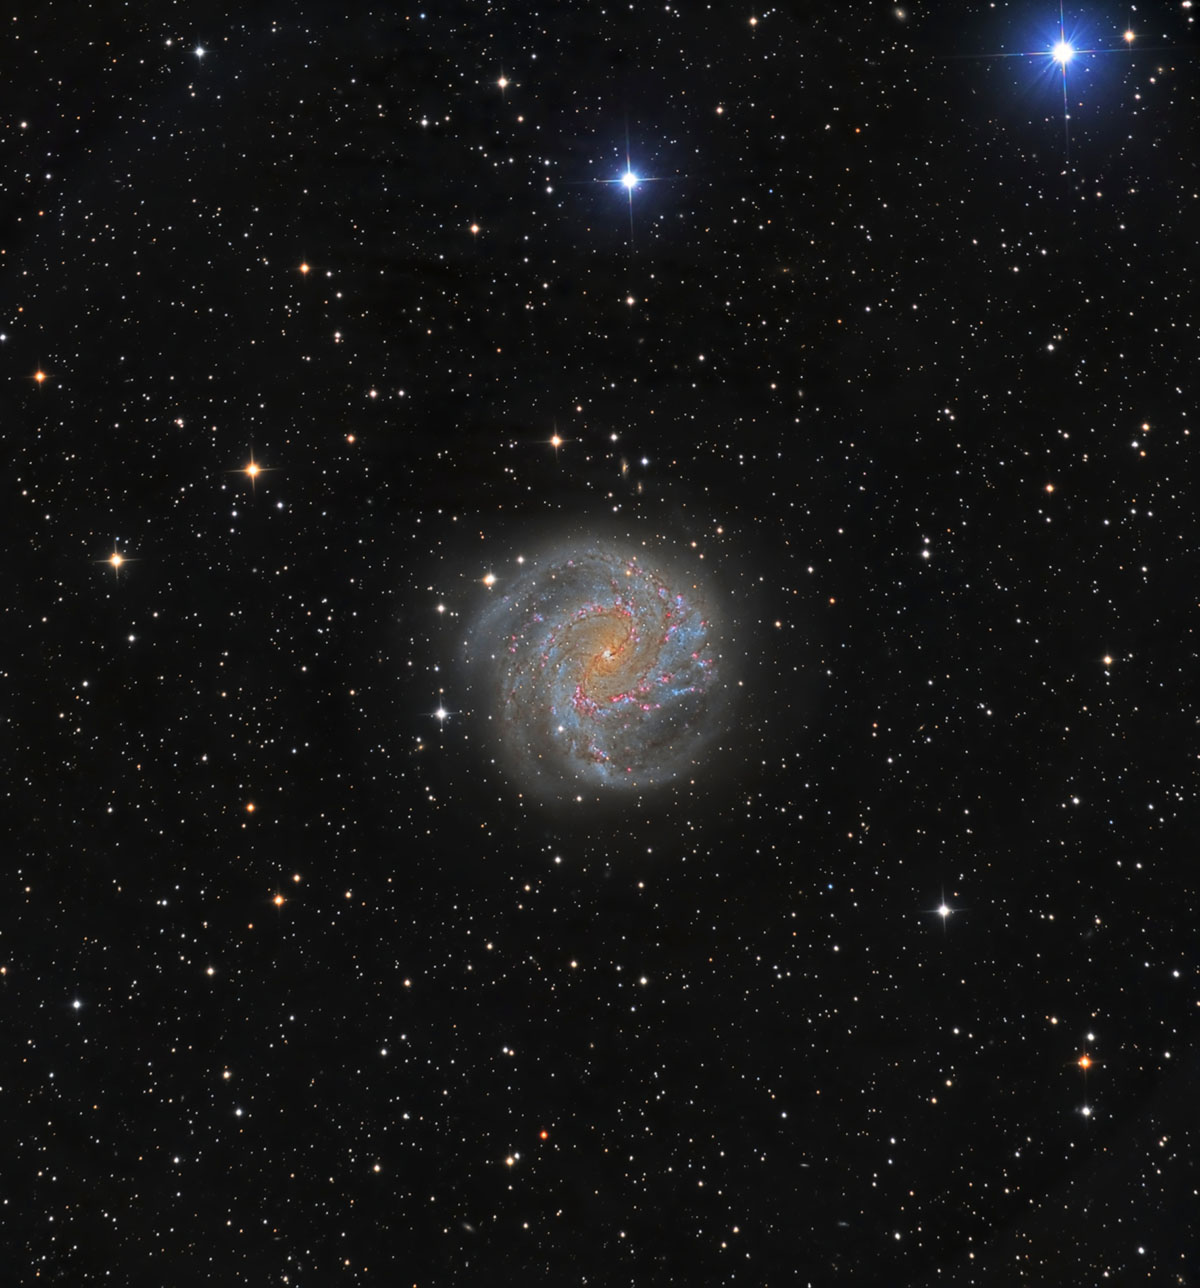 Fotoğraf: http://www.astrobin.com/170211/B/